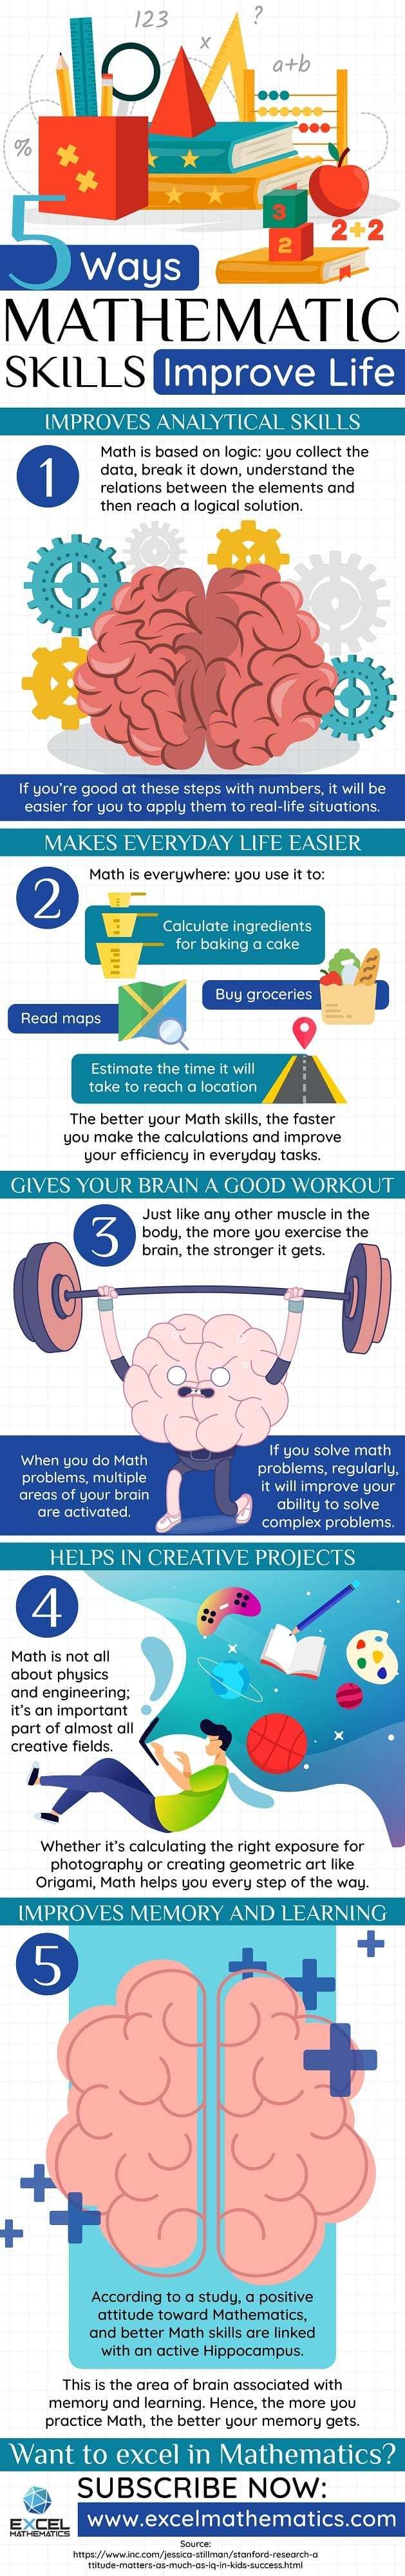 Mathematic Skills Improve Life, 5 Ways Mathematic Skills Improve Life